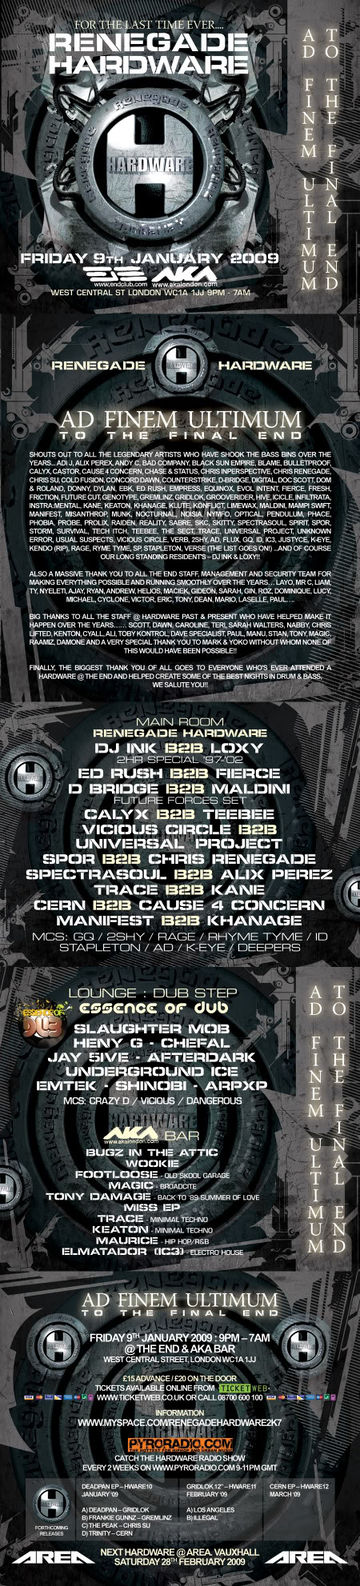 2009-01-09 - Renegade Hardware, The End, London.jpg